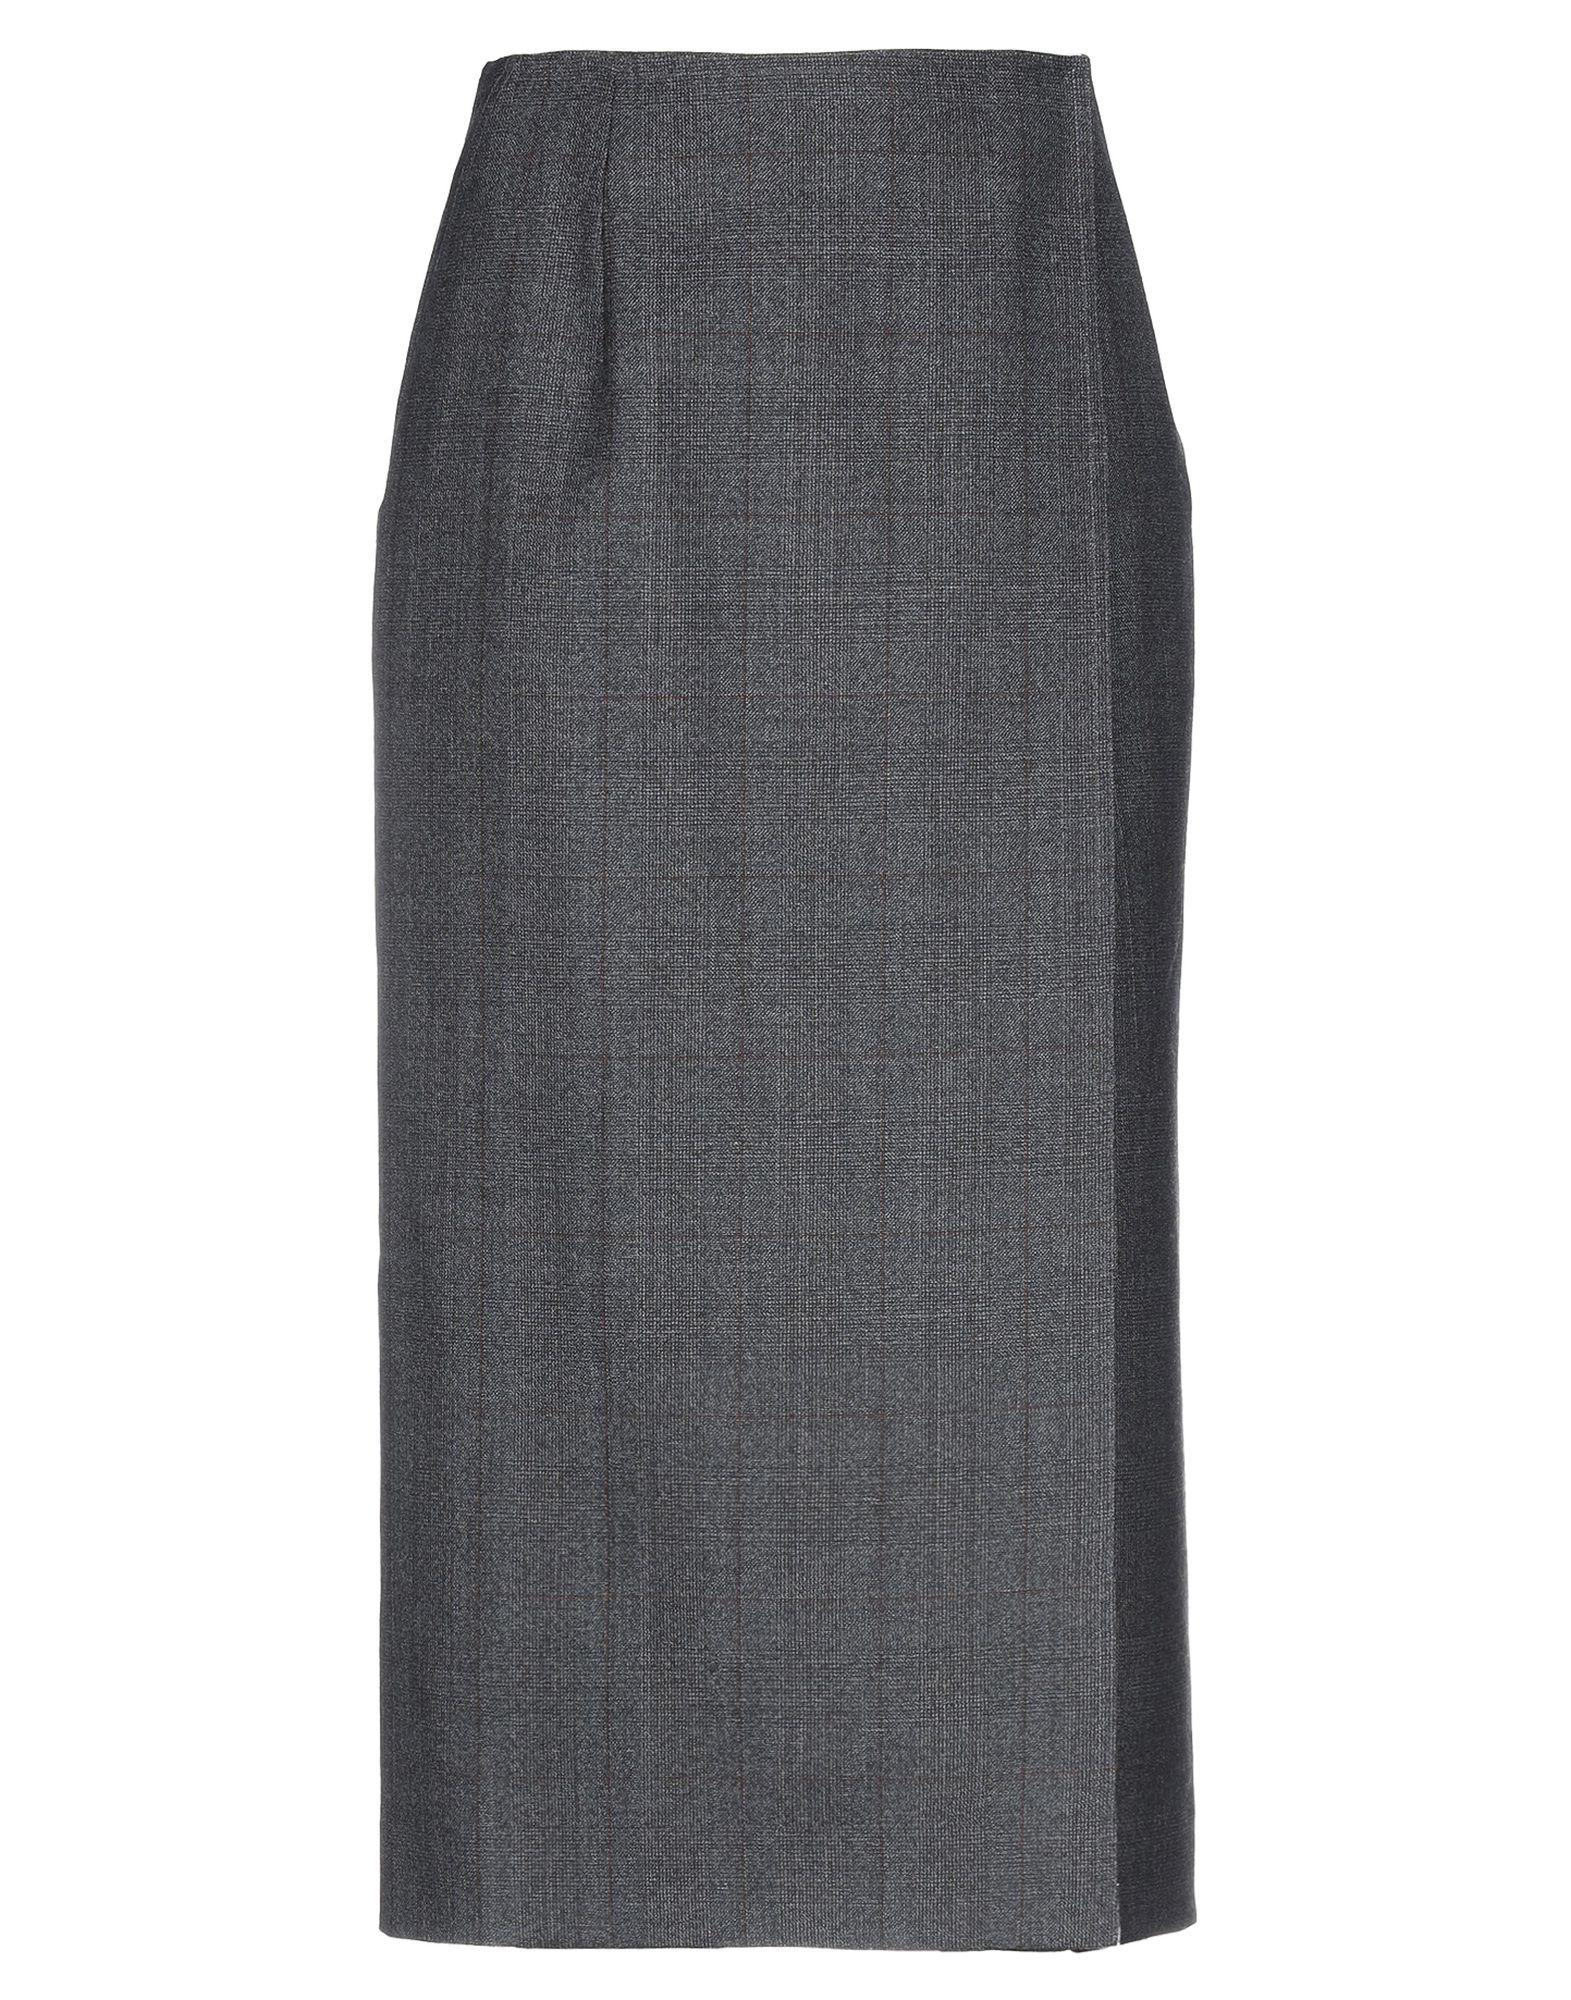 CALVIN KLEIN 205W39NYC Юбка длиной 3/4 calvin klein 205w39nyc длинная юбка